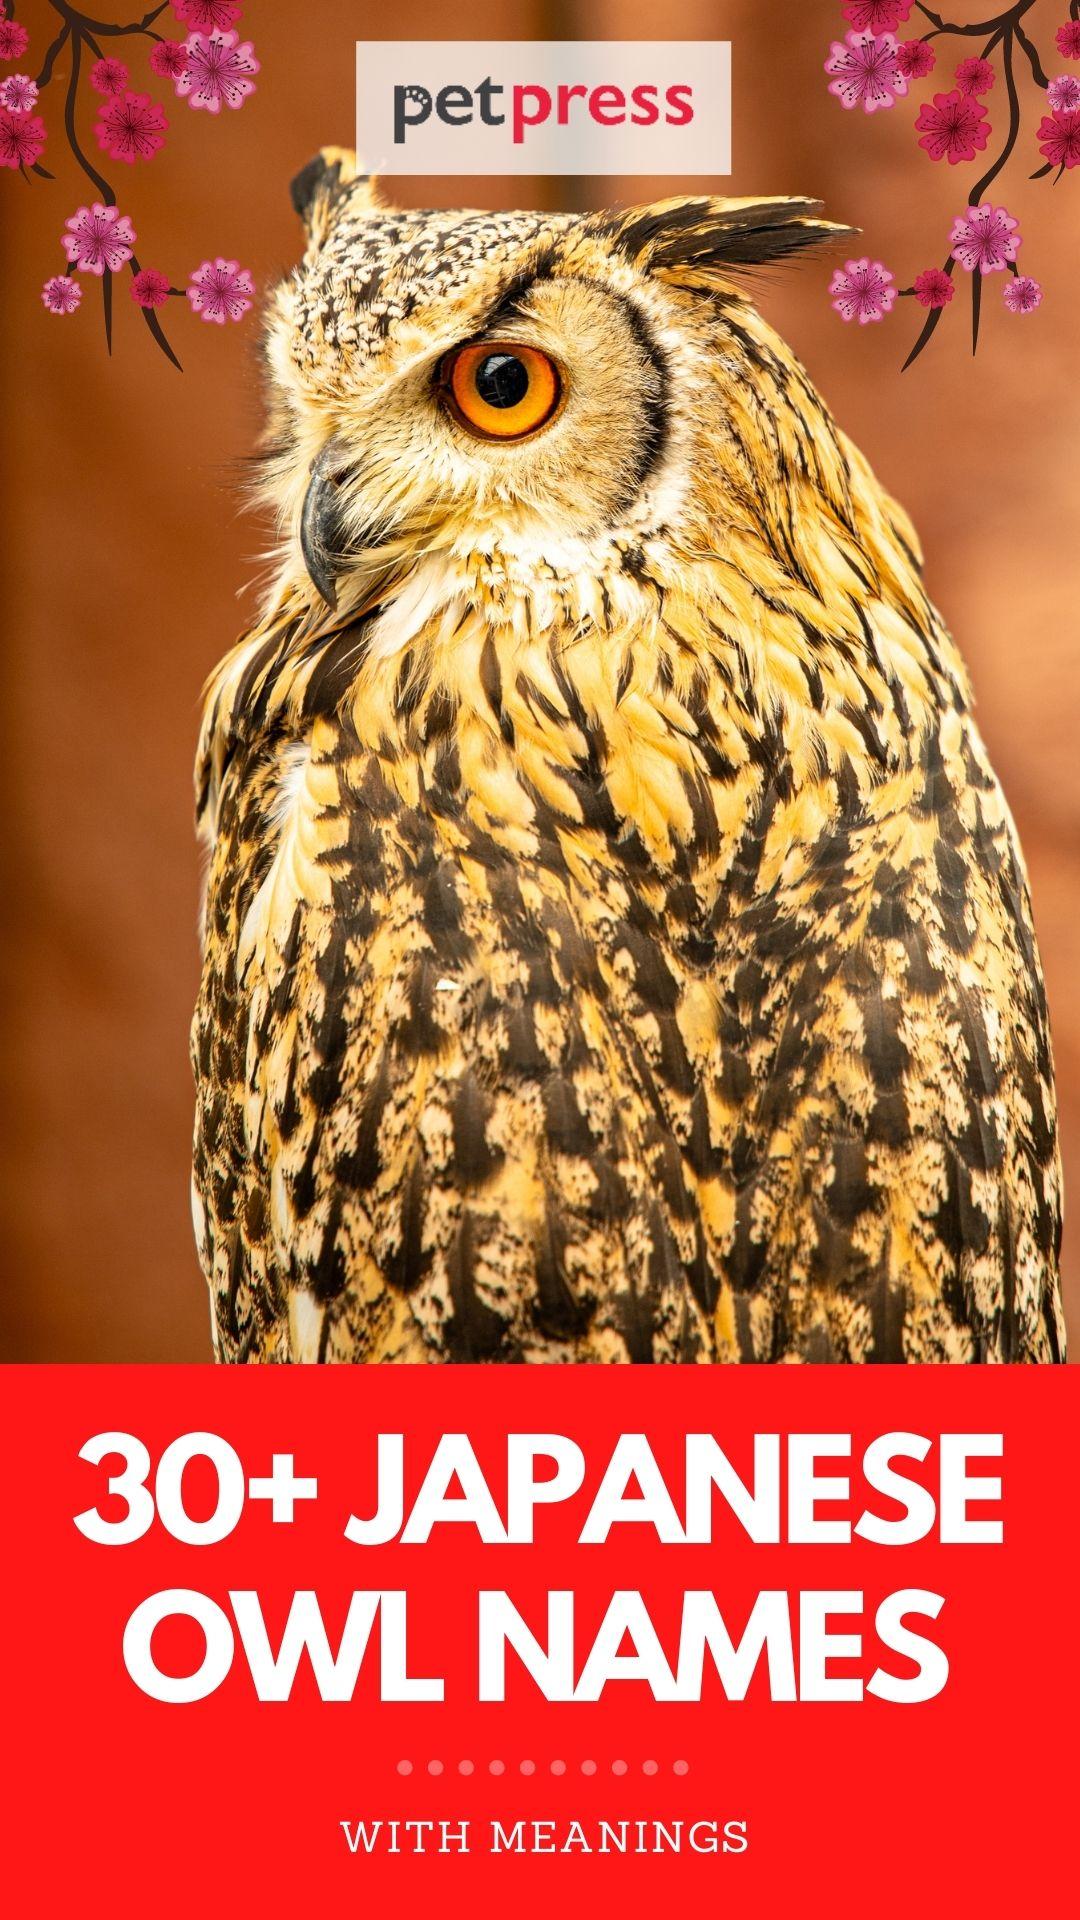 japanese owl names for naming an owl